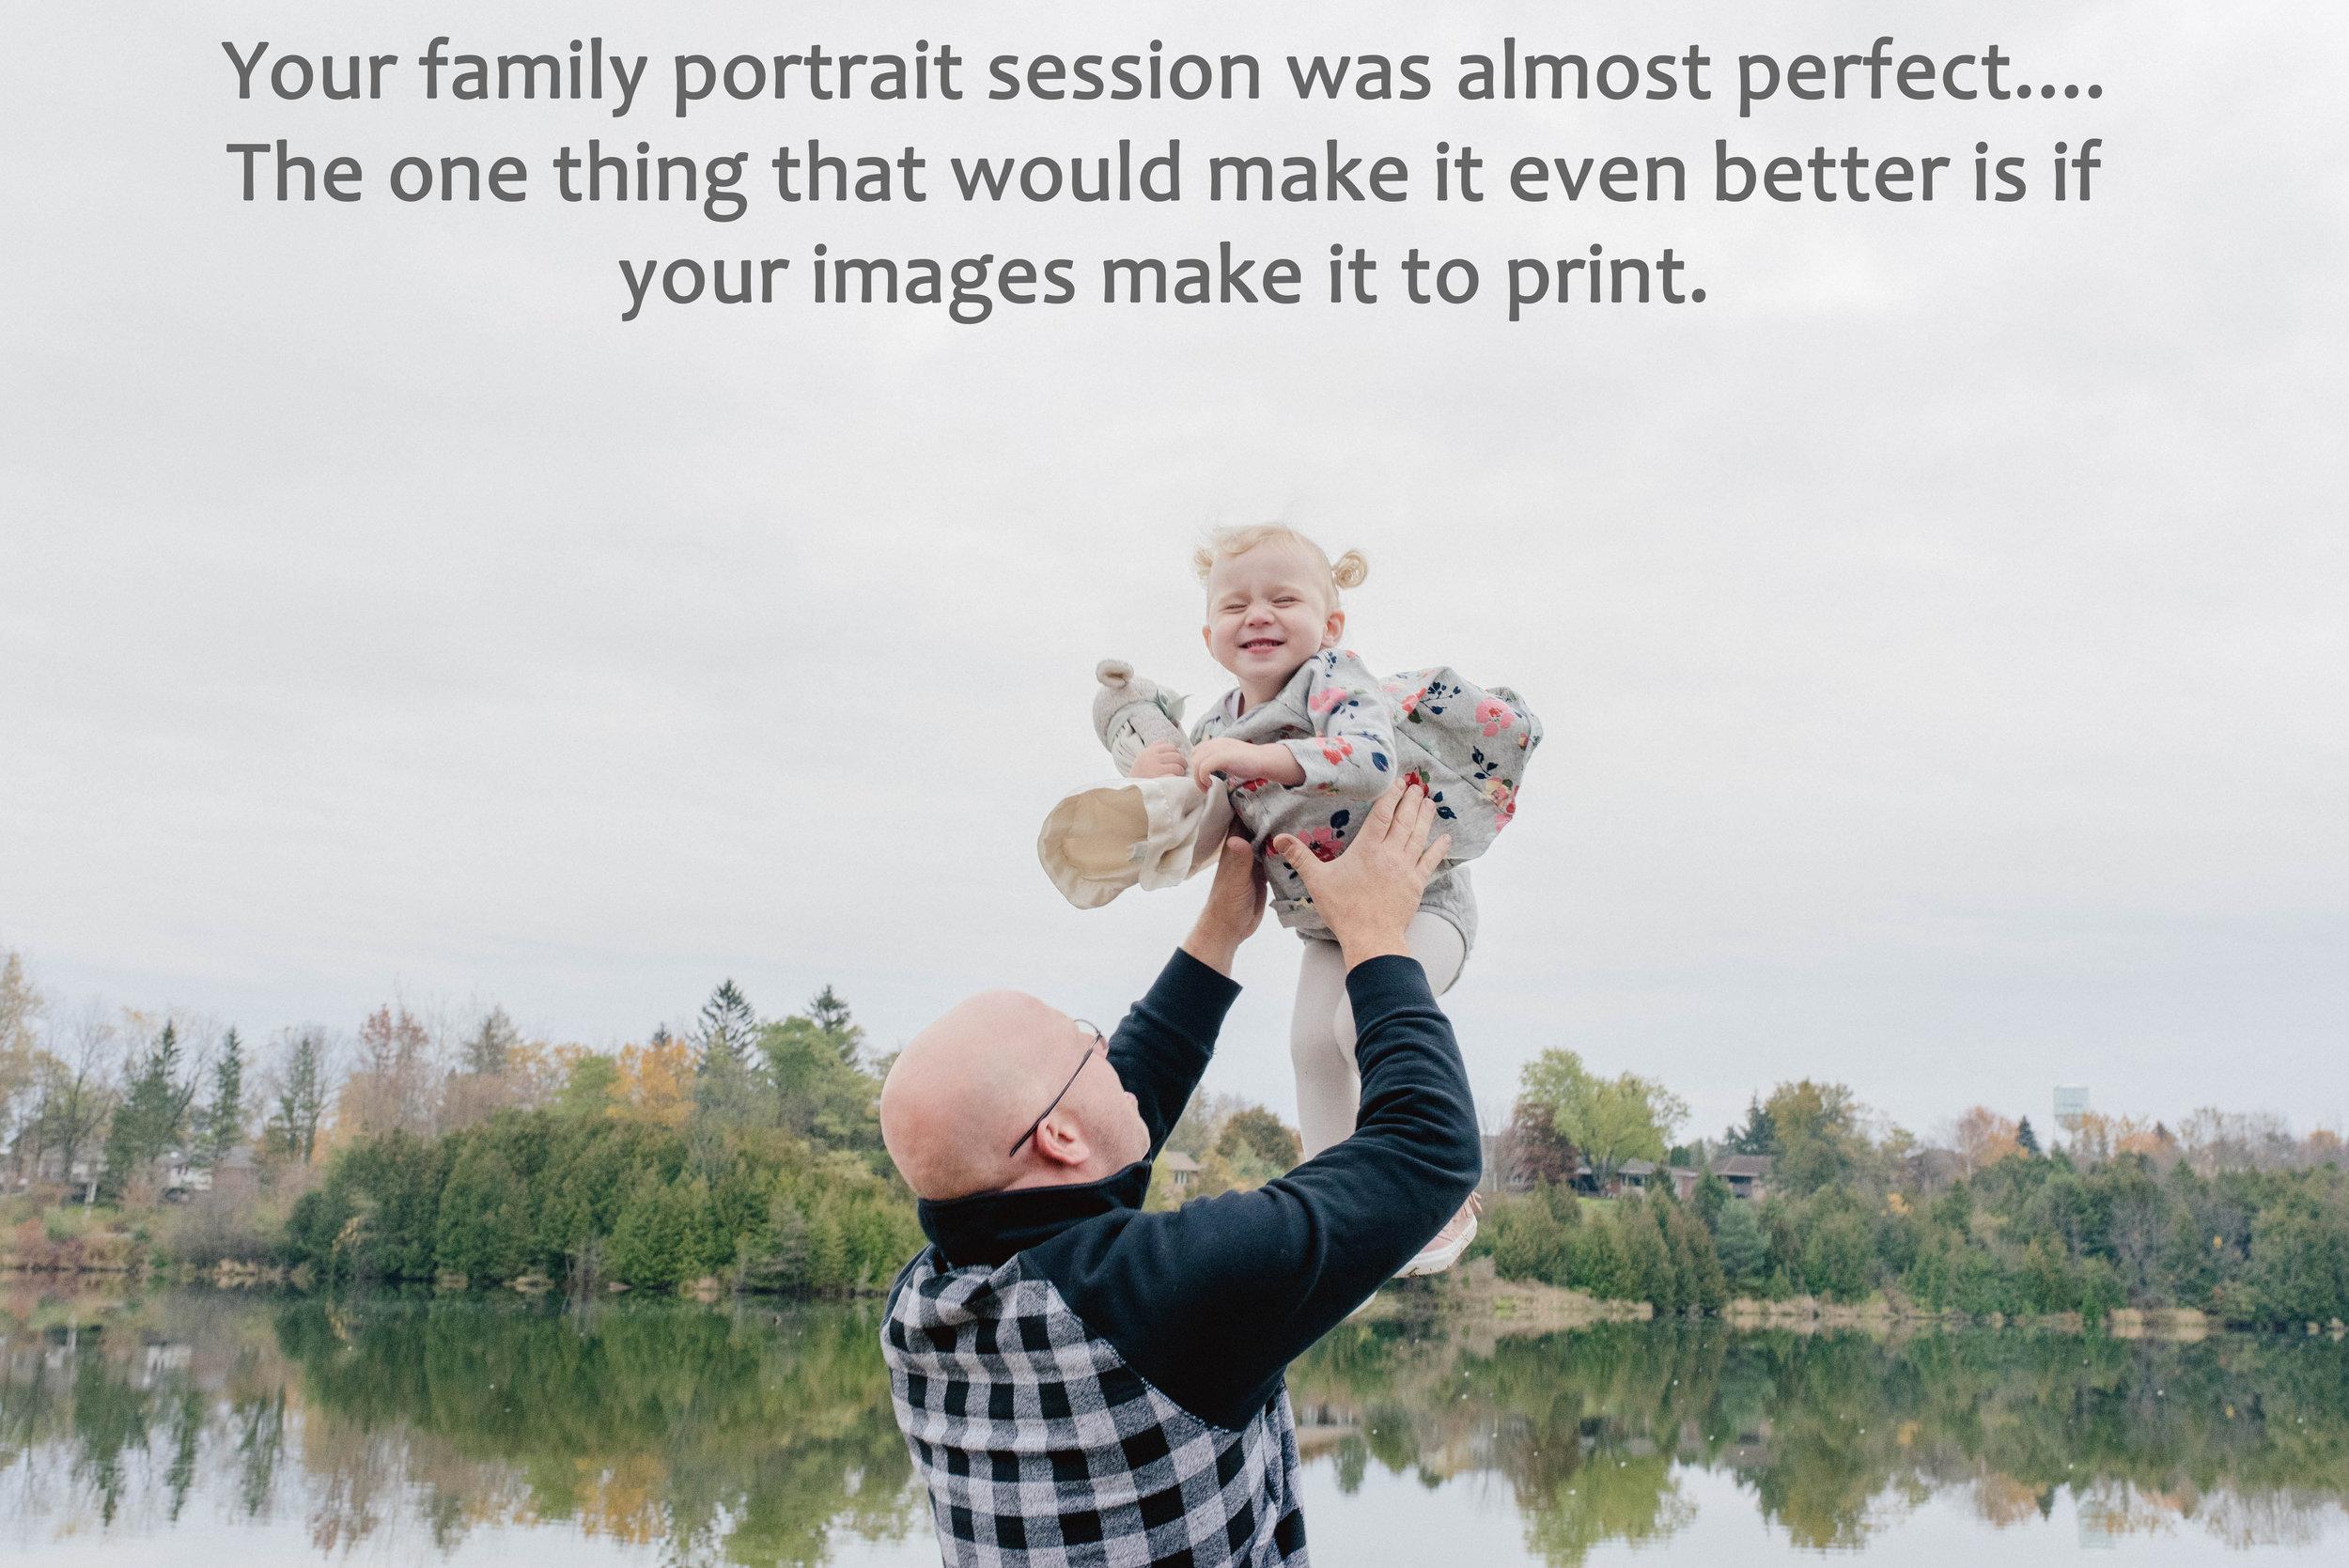 print2.jpg